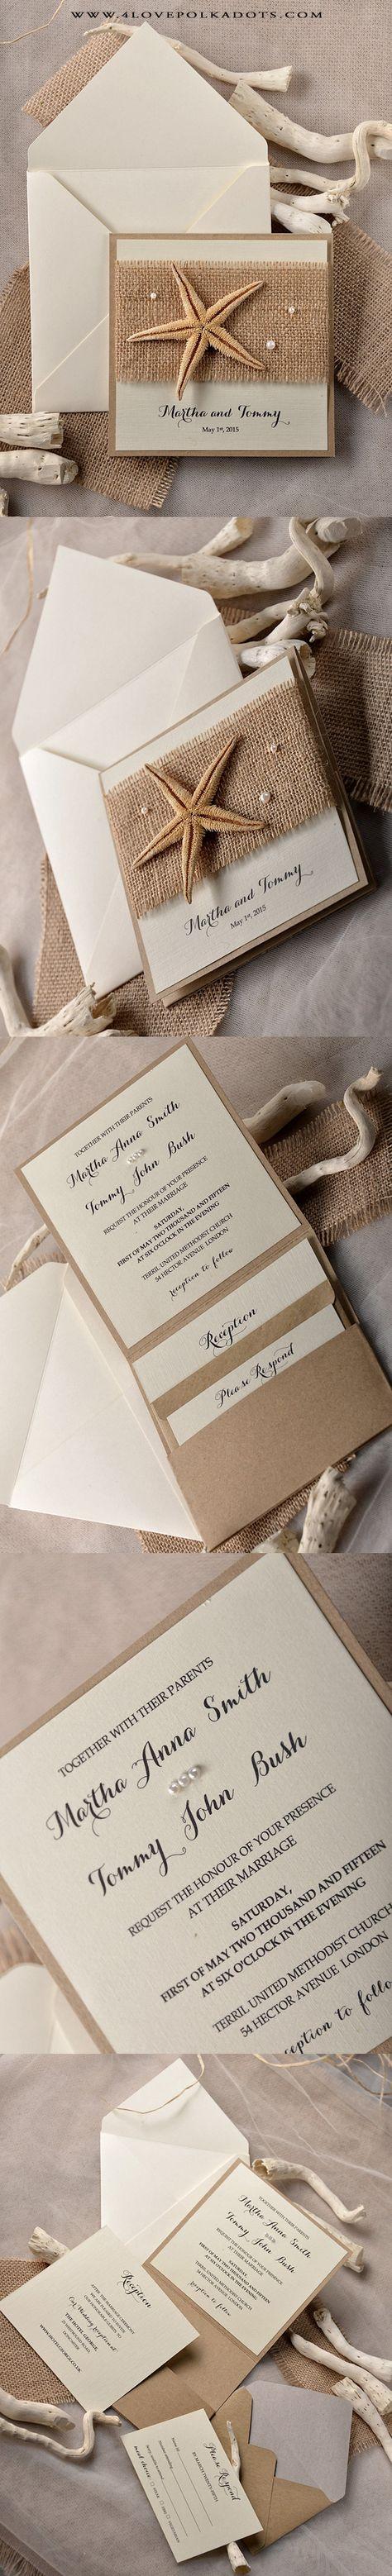 Awesome Beach Theme Wedding Cards Gallery - The Wedding Ideas ...